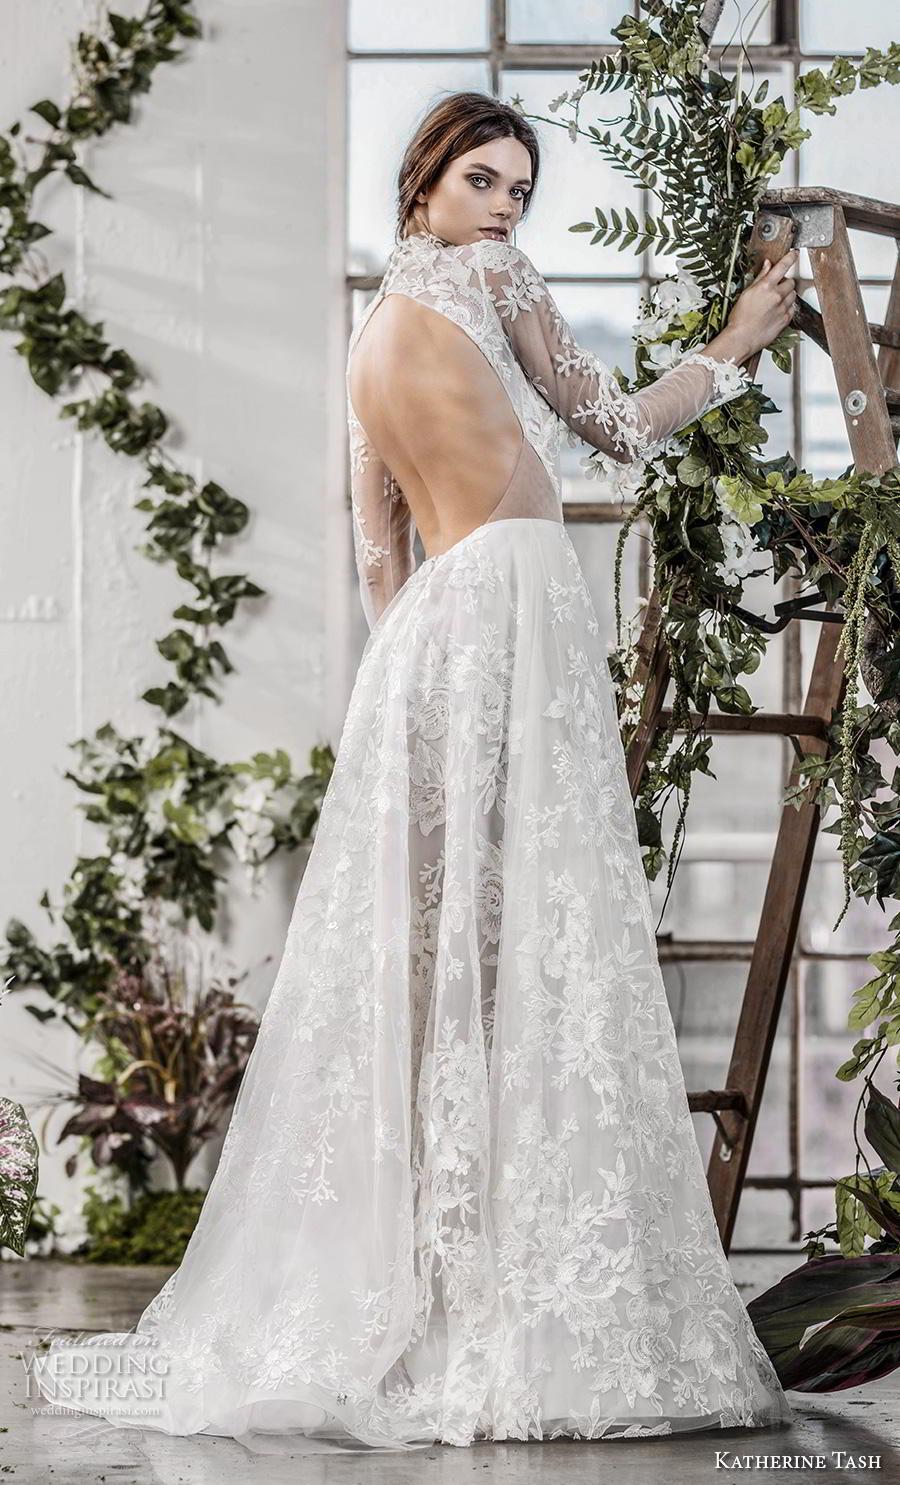 katherine tash fall 2019 bridal long sleeves high neck full embellishment romantic princess a  line wedding dress keyhole back sweep train (11) bv